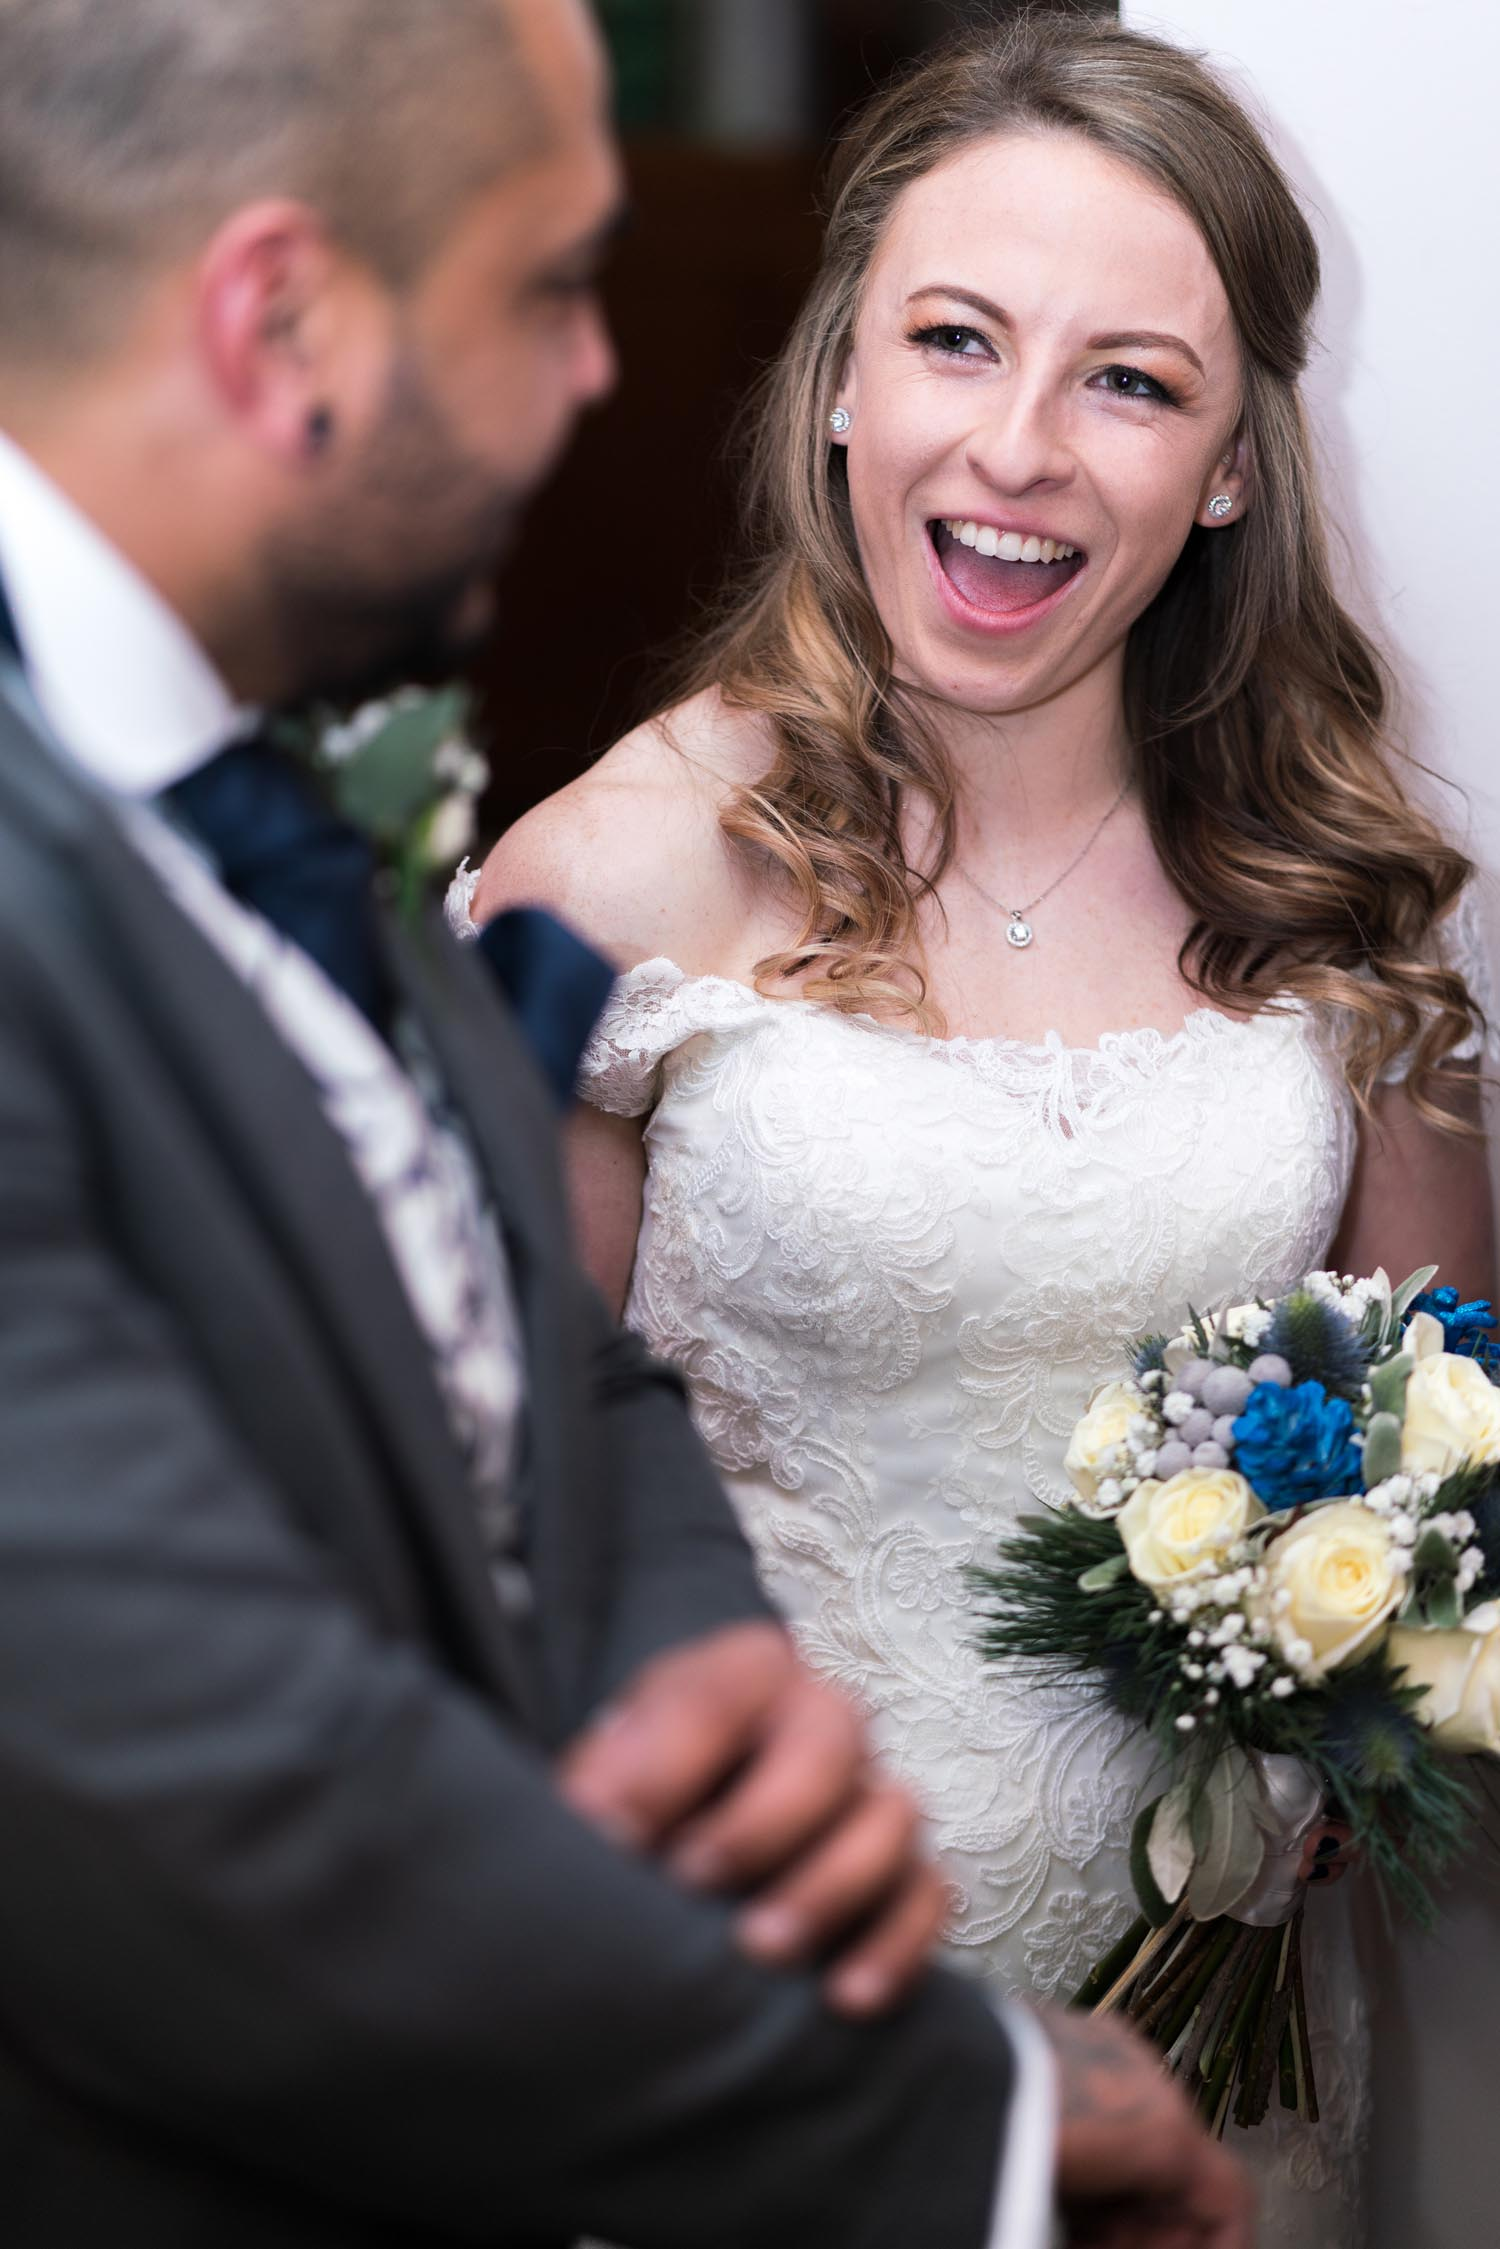 wedding-photos-bride-groom-family-friends-ye-olde-plough-house-essex-131.jpg